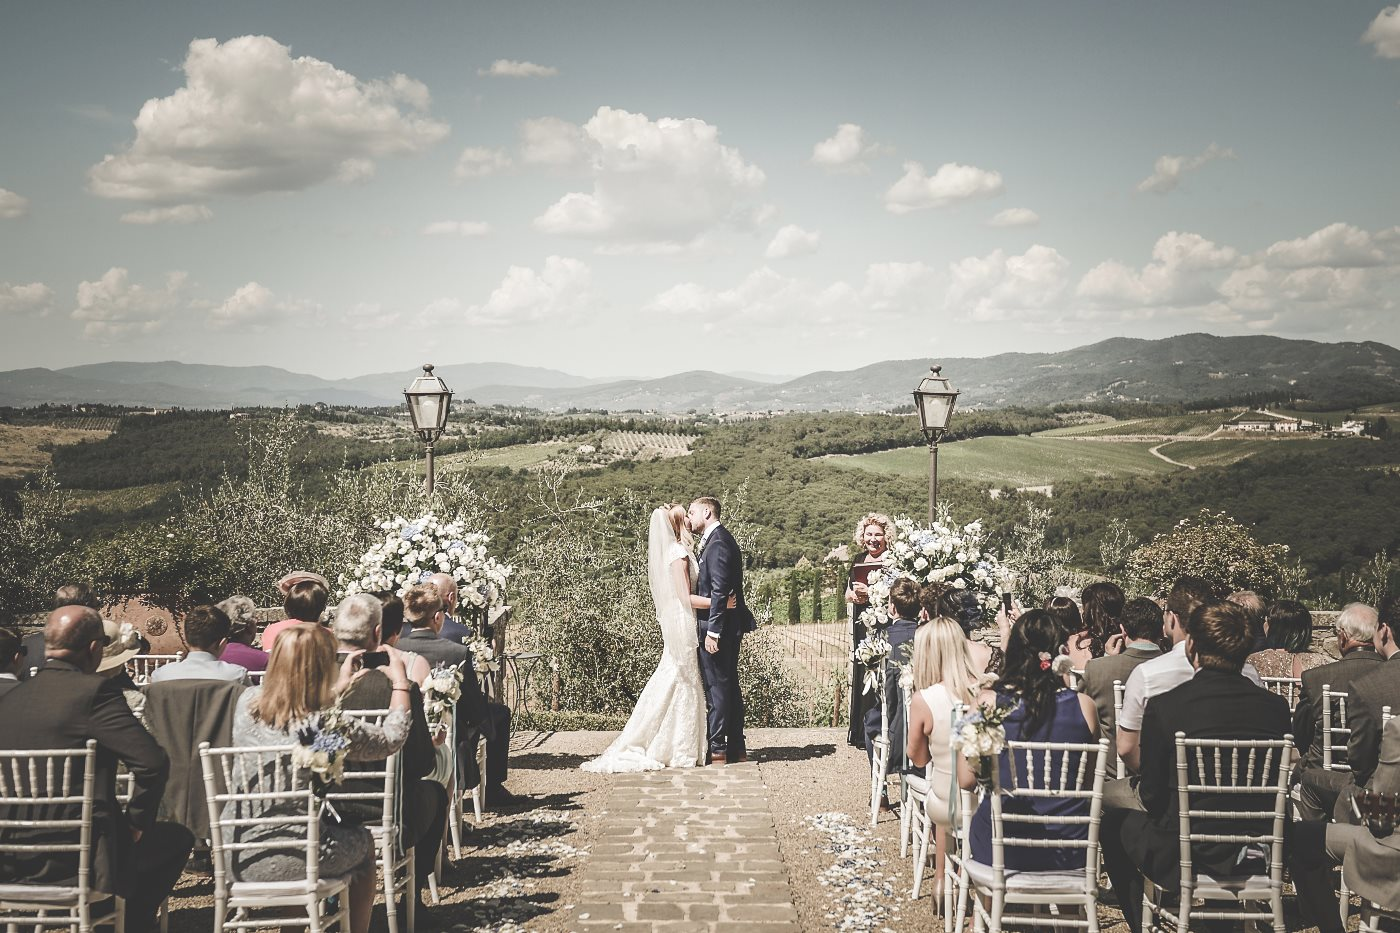 wedding_photos_castello_di_gabbiano_08.jpg